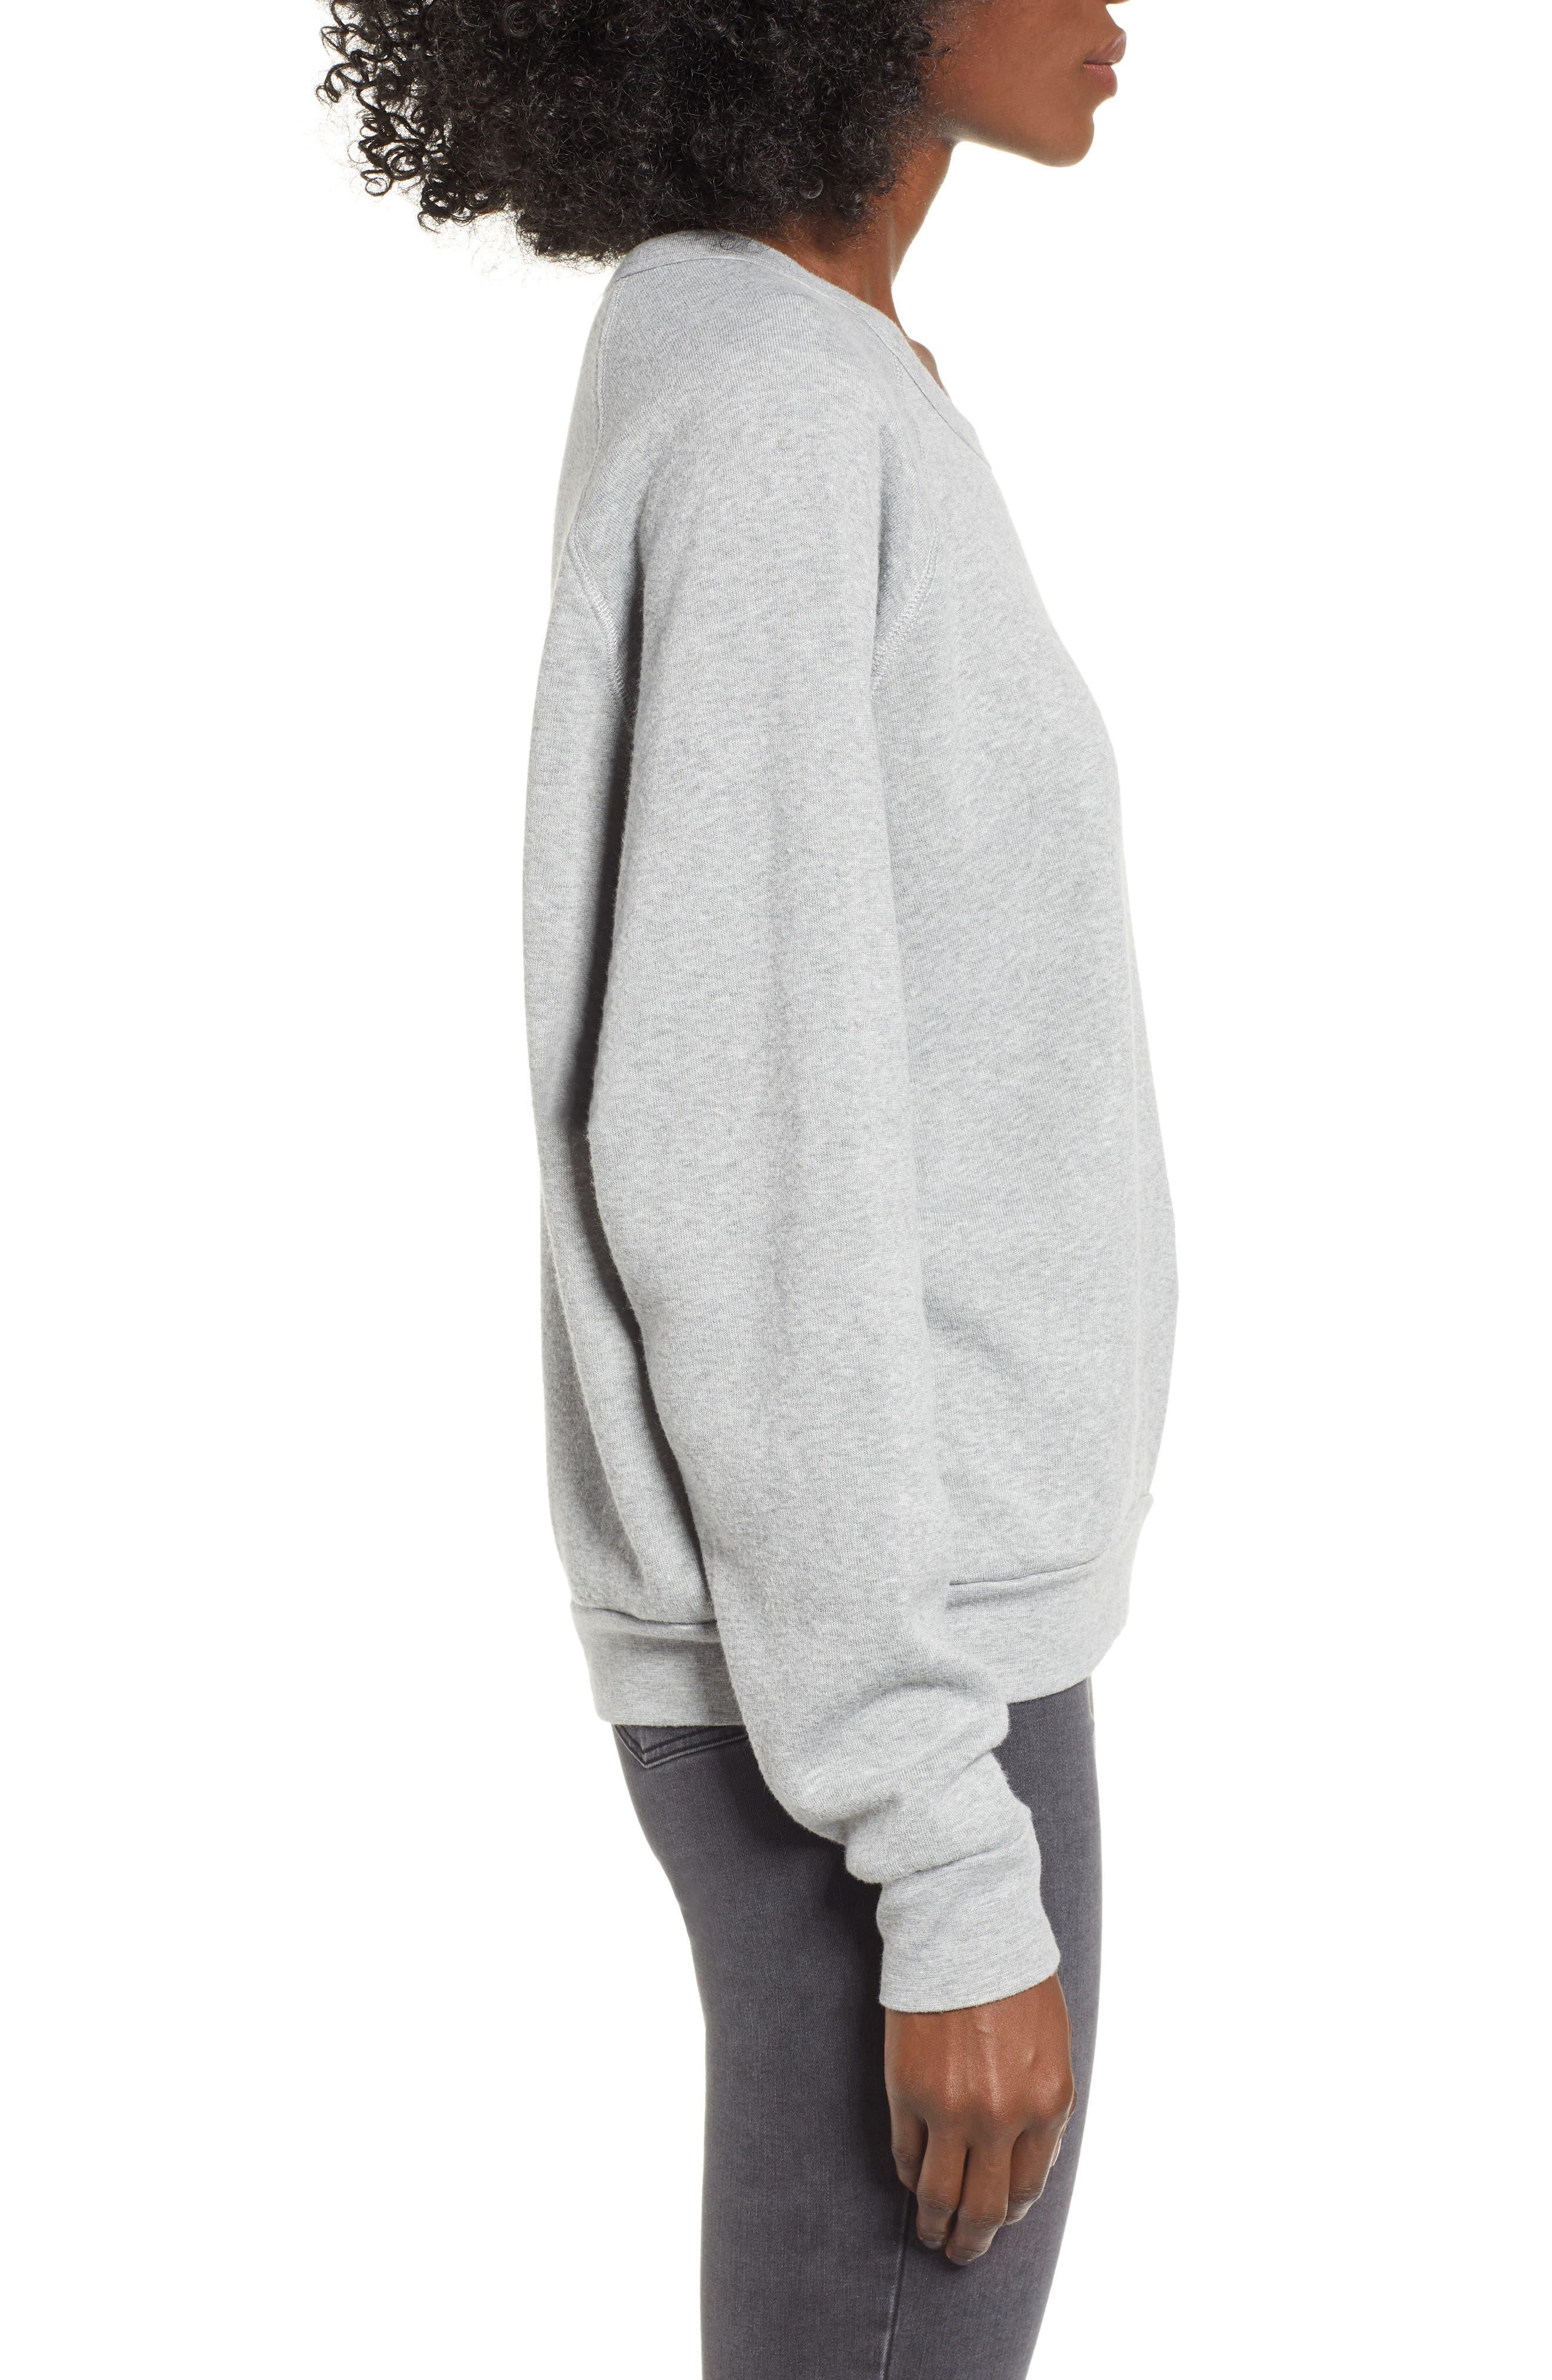 Naughty/Nice Reversible Sweatshirt,                             Alternate thumbnail 4, color,                             HEATHER GREY